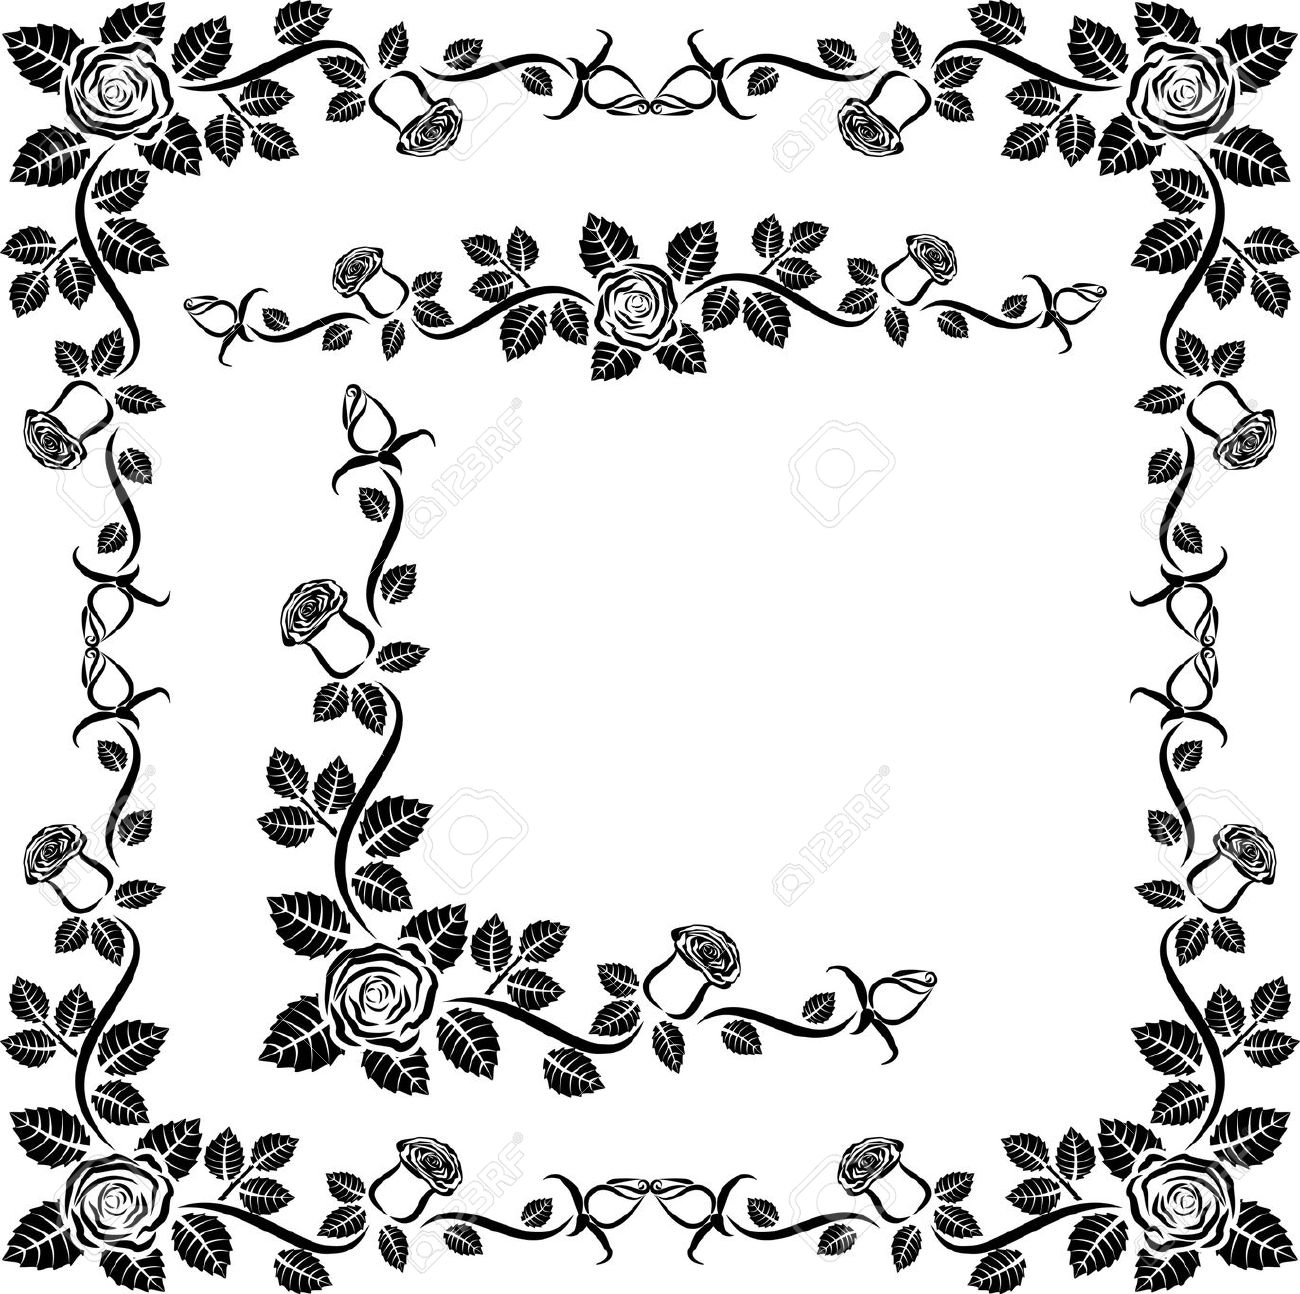 1300x1294 White Rose Clipart Decorative